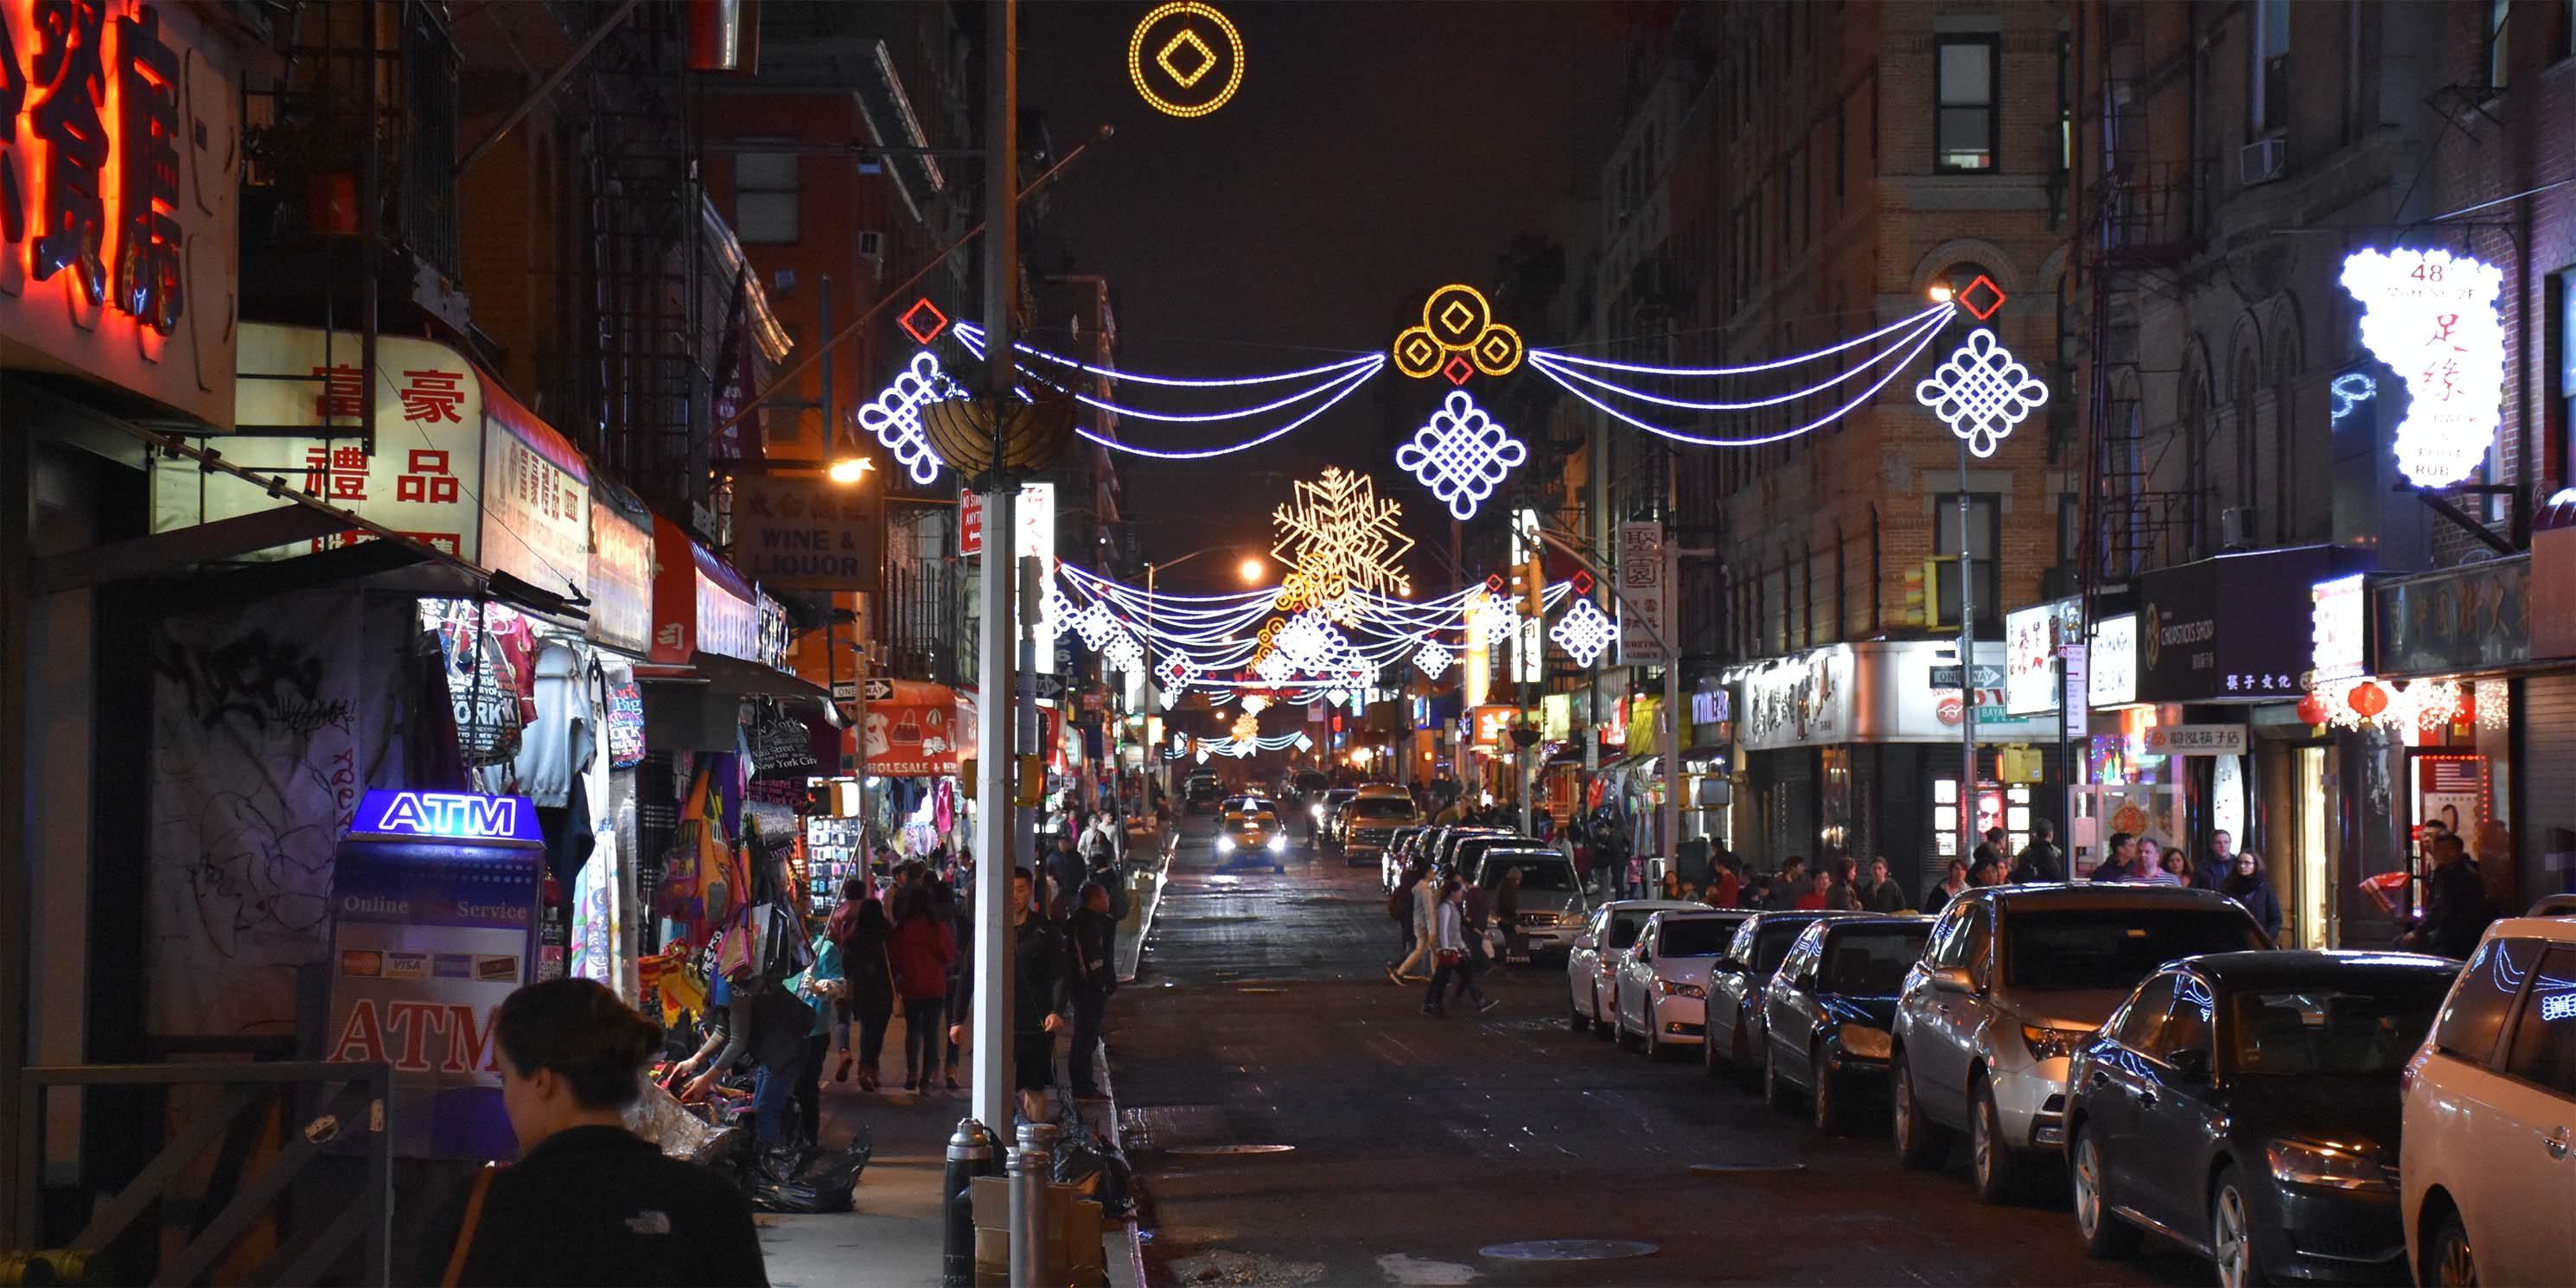 Mott Street at night with festive lights